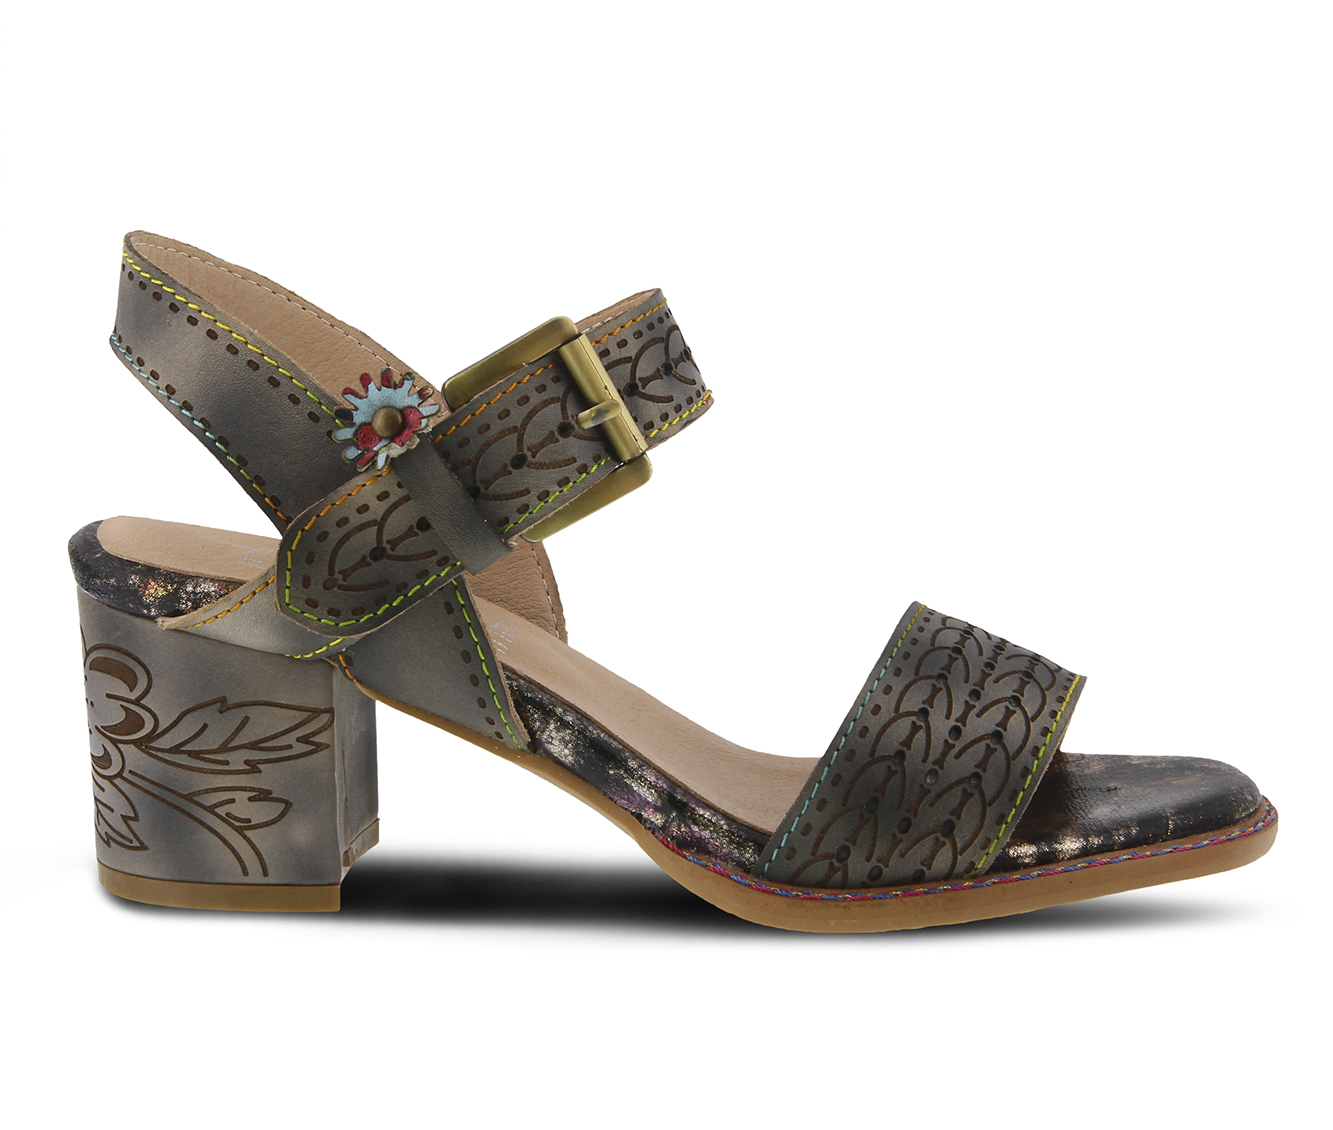 L'Artiste Avonora Women's Dress Shoe (Gray Leather)